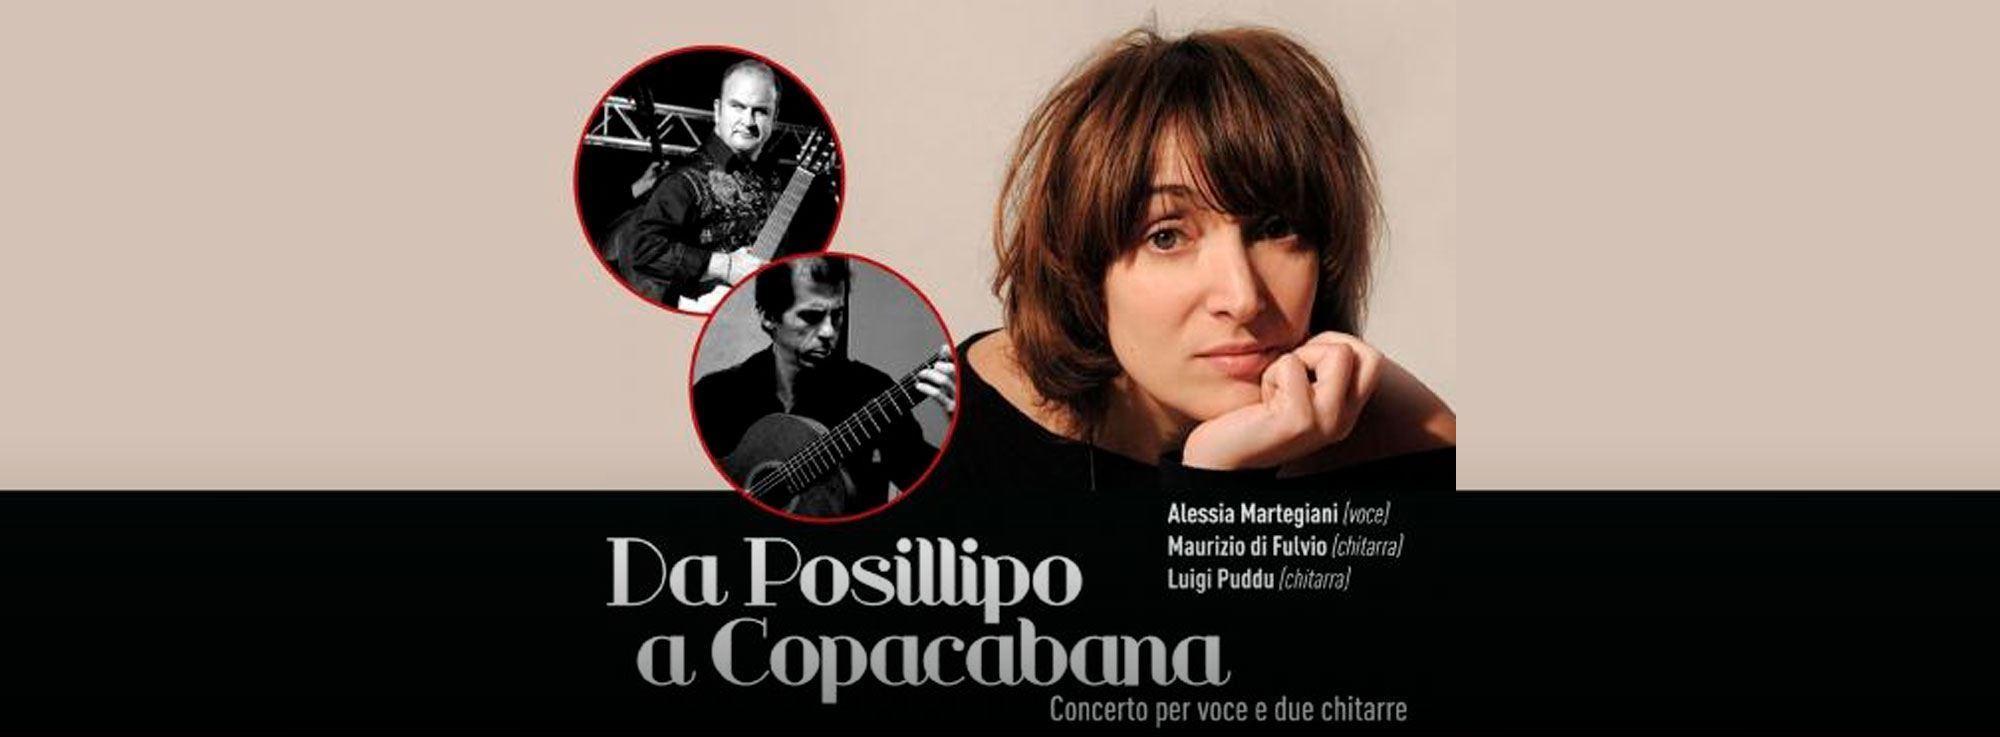 Brindisi: Da Posillipo a Copacabana